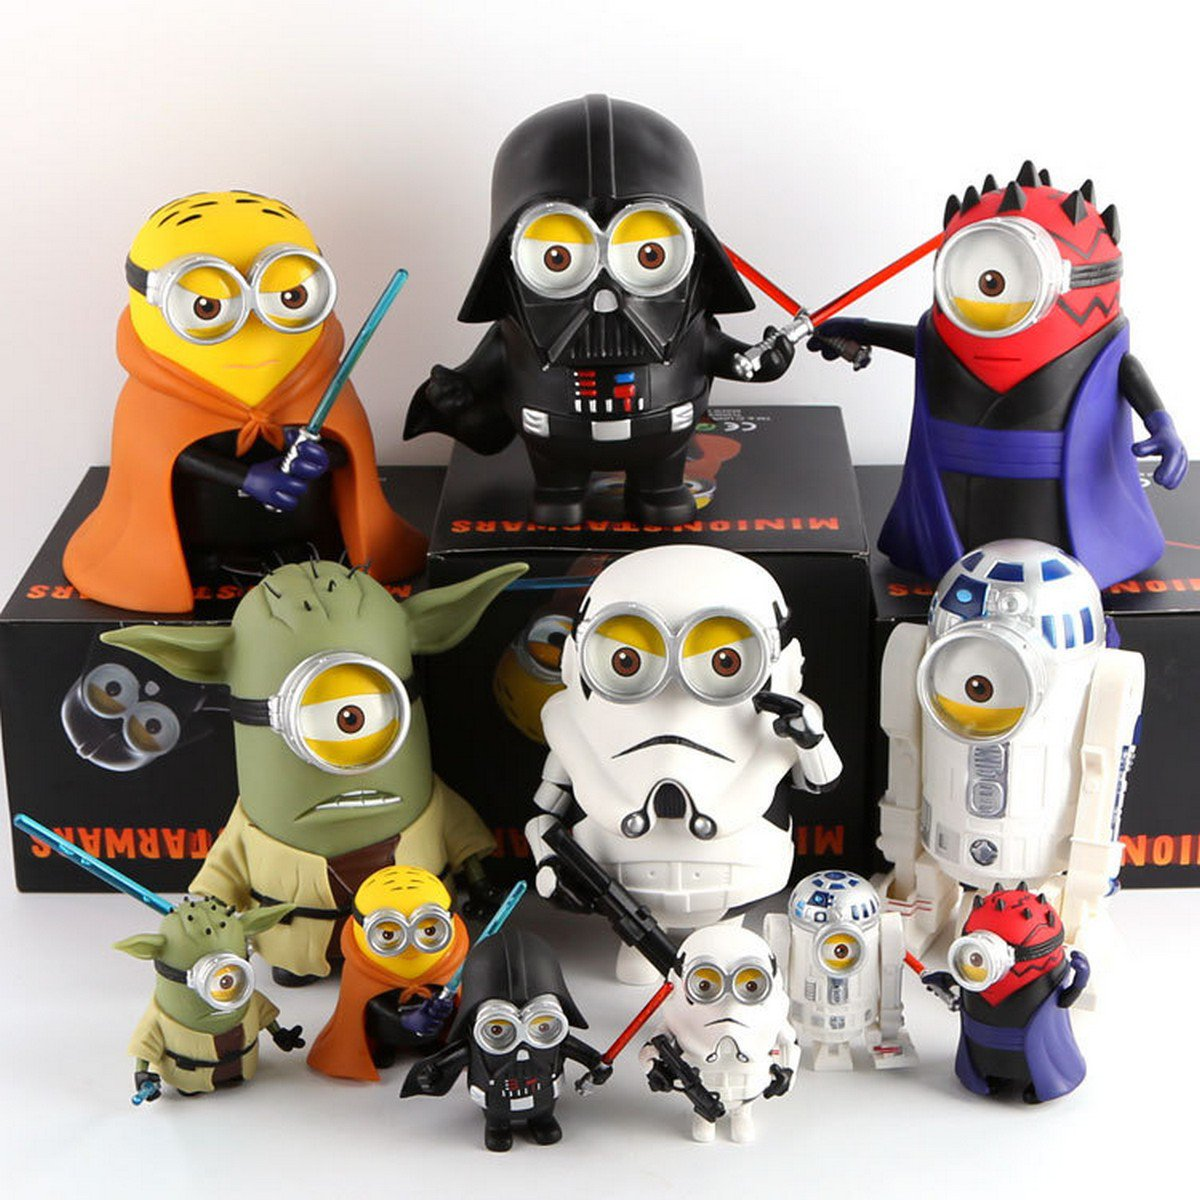 Buy 20cm Big Size! Minions Cosplay Star Wars Darth Vader Darth Maul Luke Yoda PVC Soft Material Dec